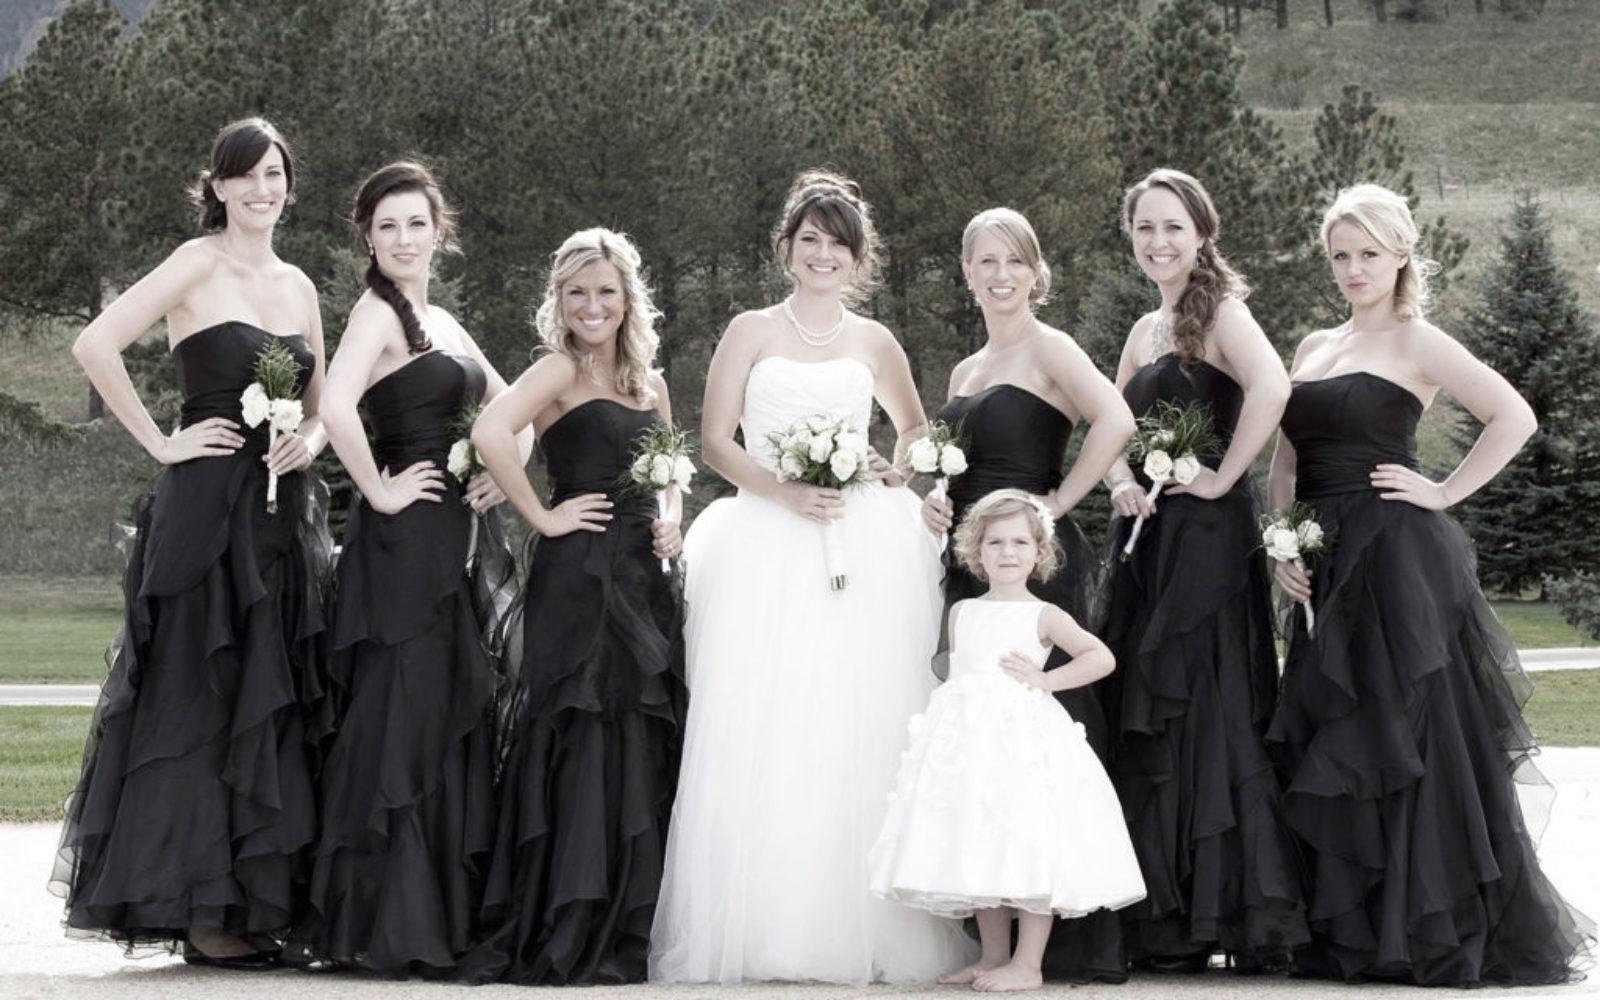 weddingphotographycoloradosprings_49-1024x640